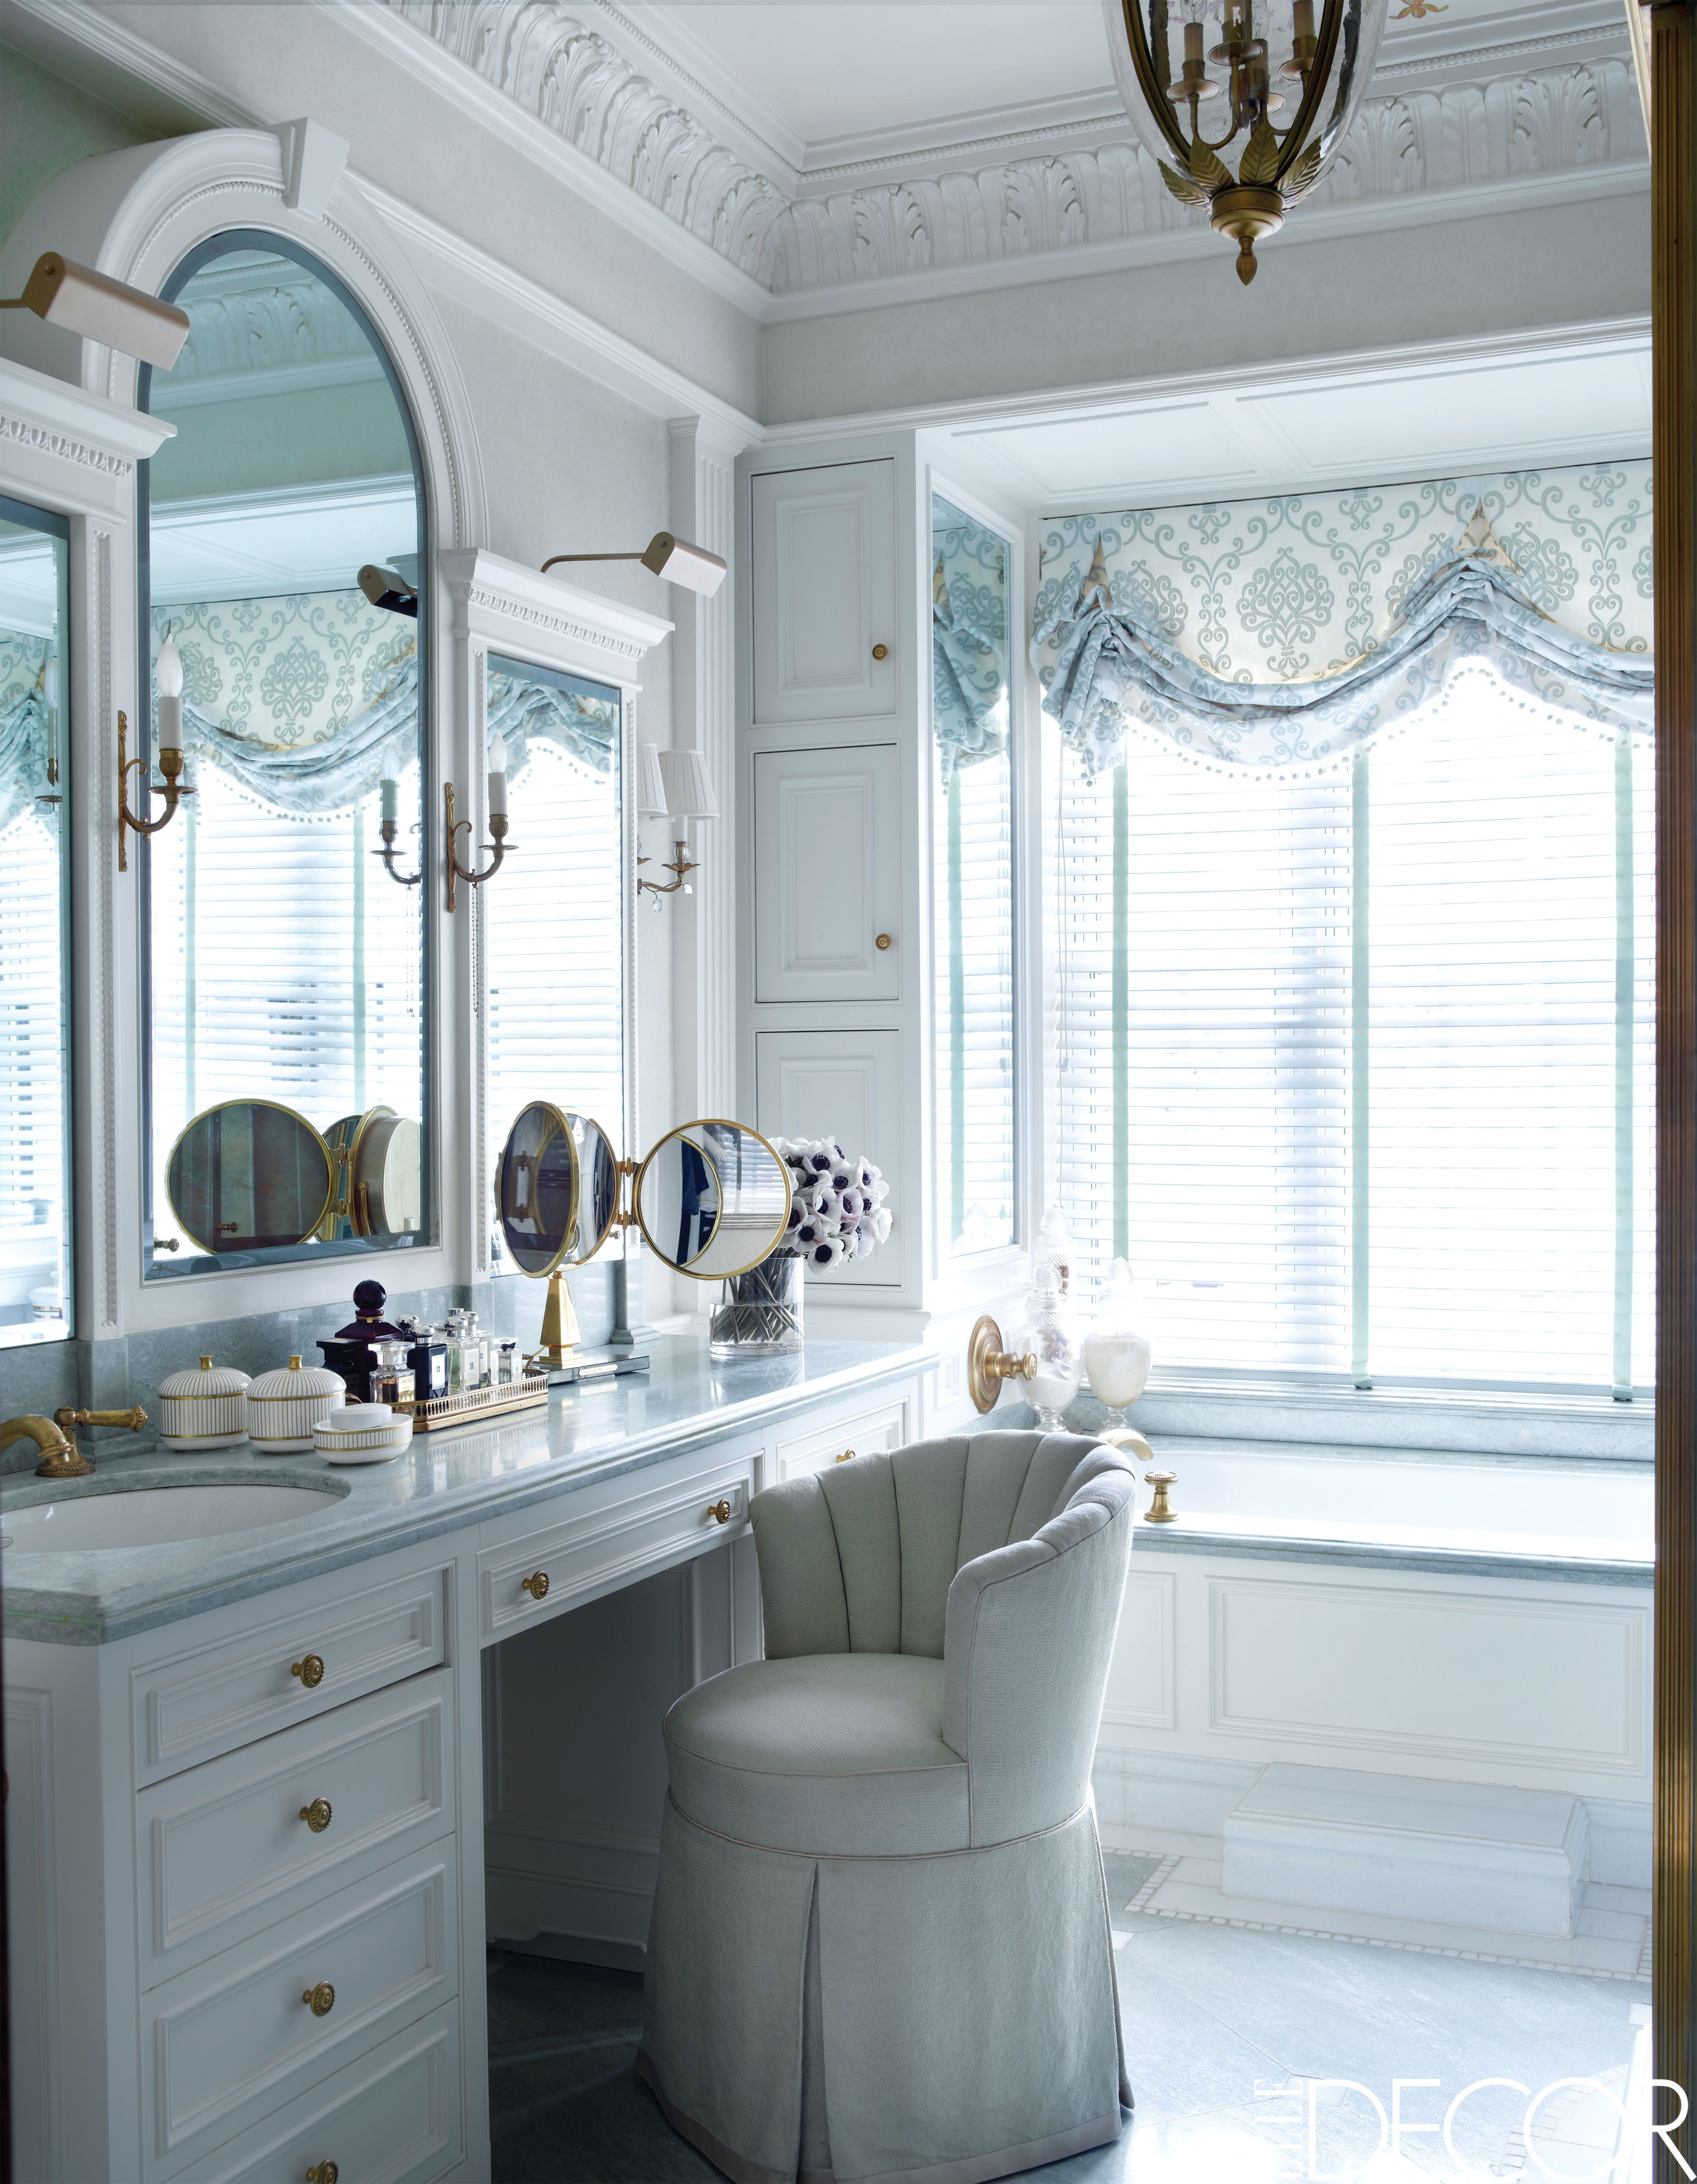 20 bathroom mirror design ideas - best bathroom vanity mirrors for